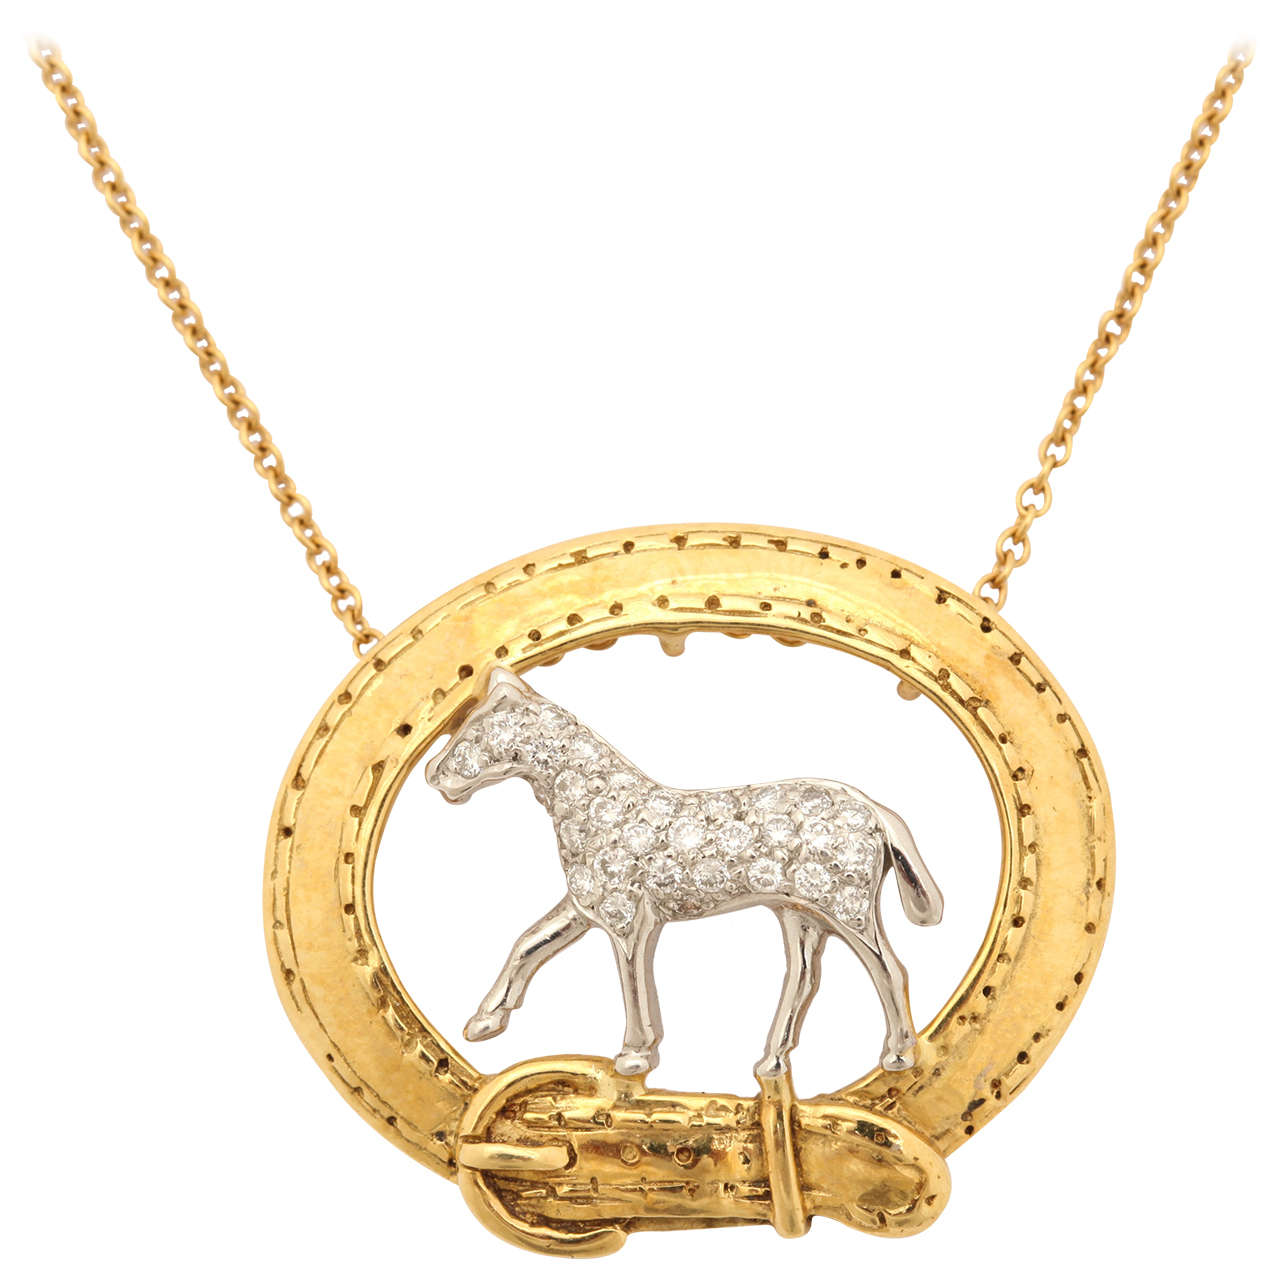 Diamond platinum horse head equestrian pendant for sale at 1stdibs diamond equestrian horse pendant aloadofball Choice Image